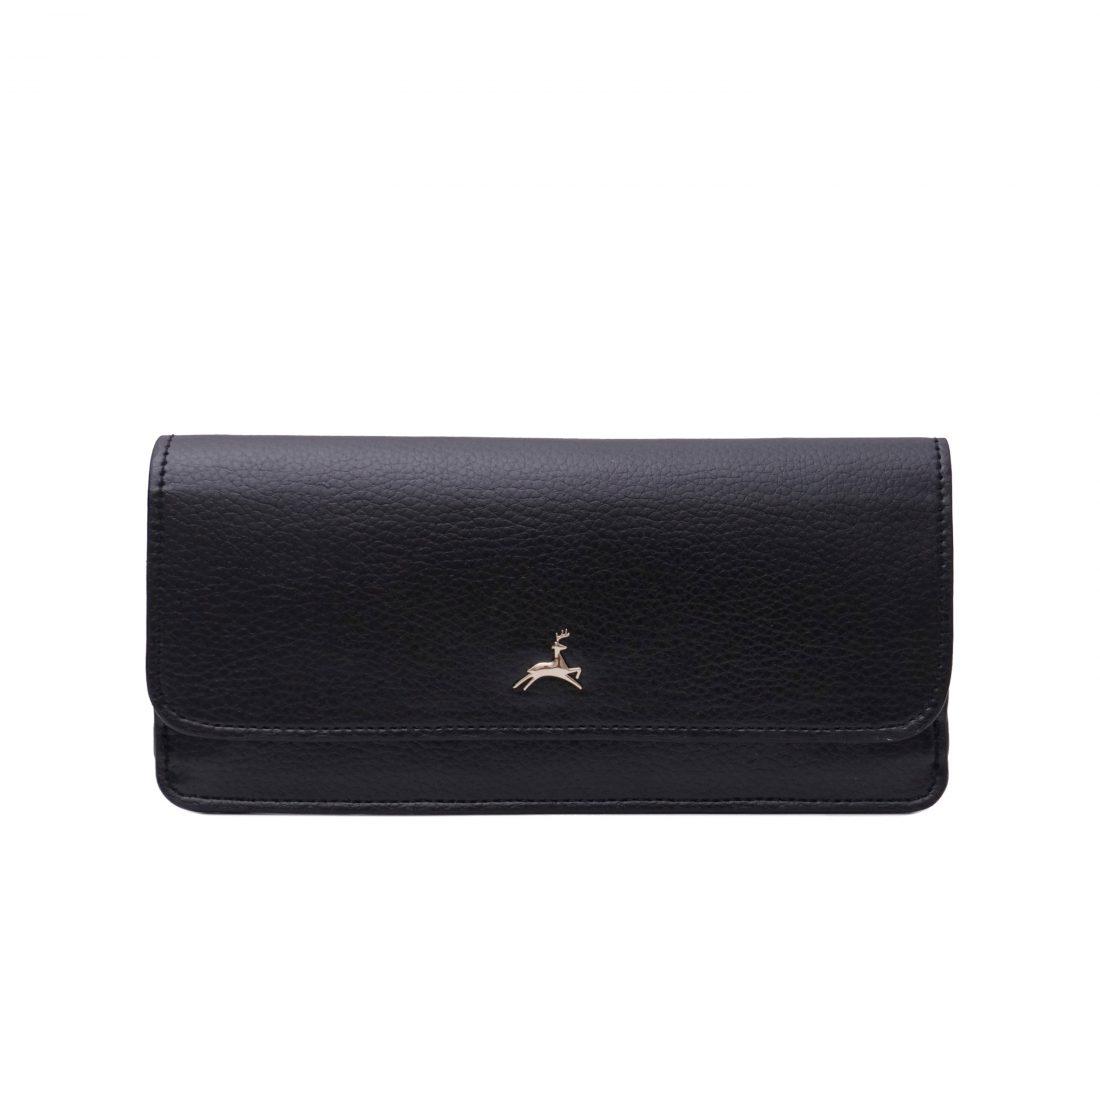 Tedu-Wallet-black-1